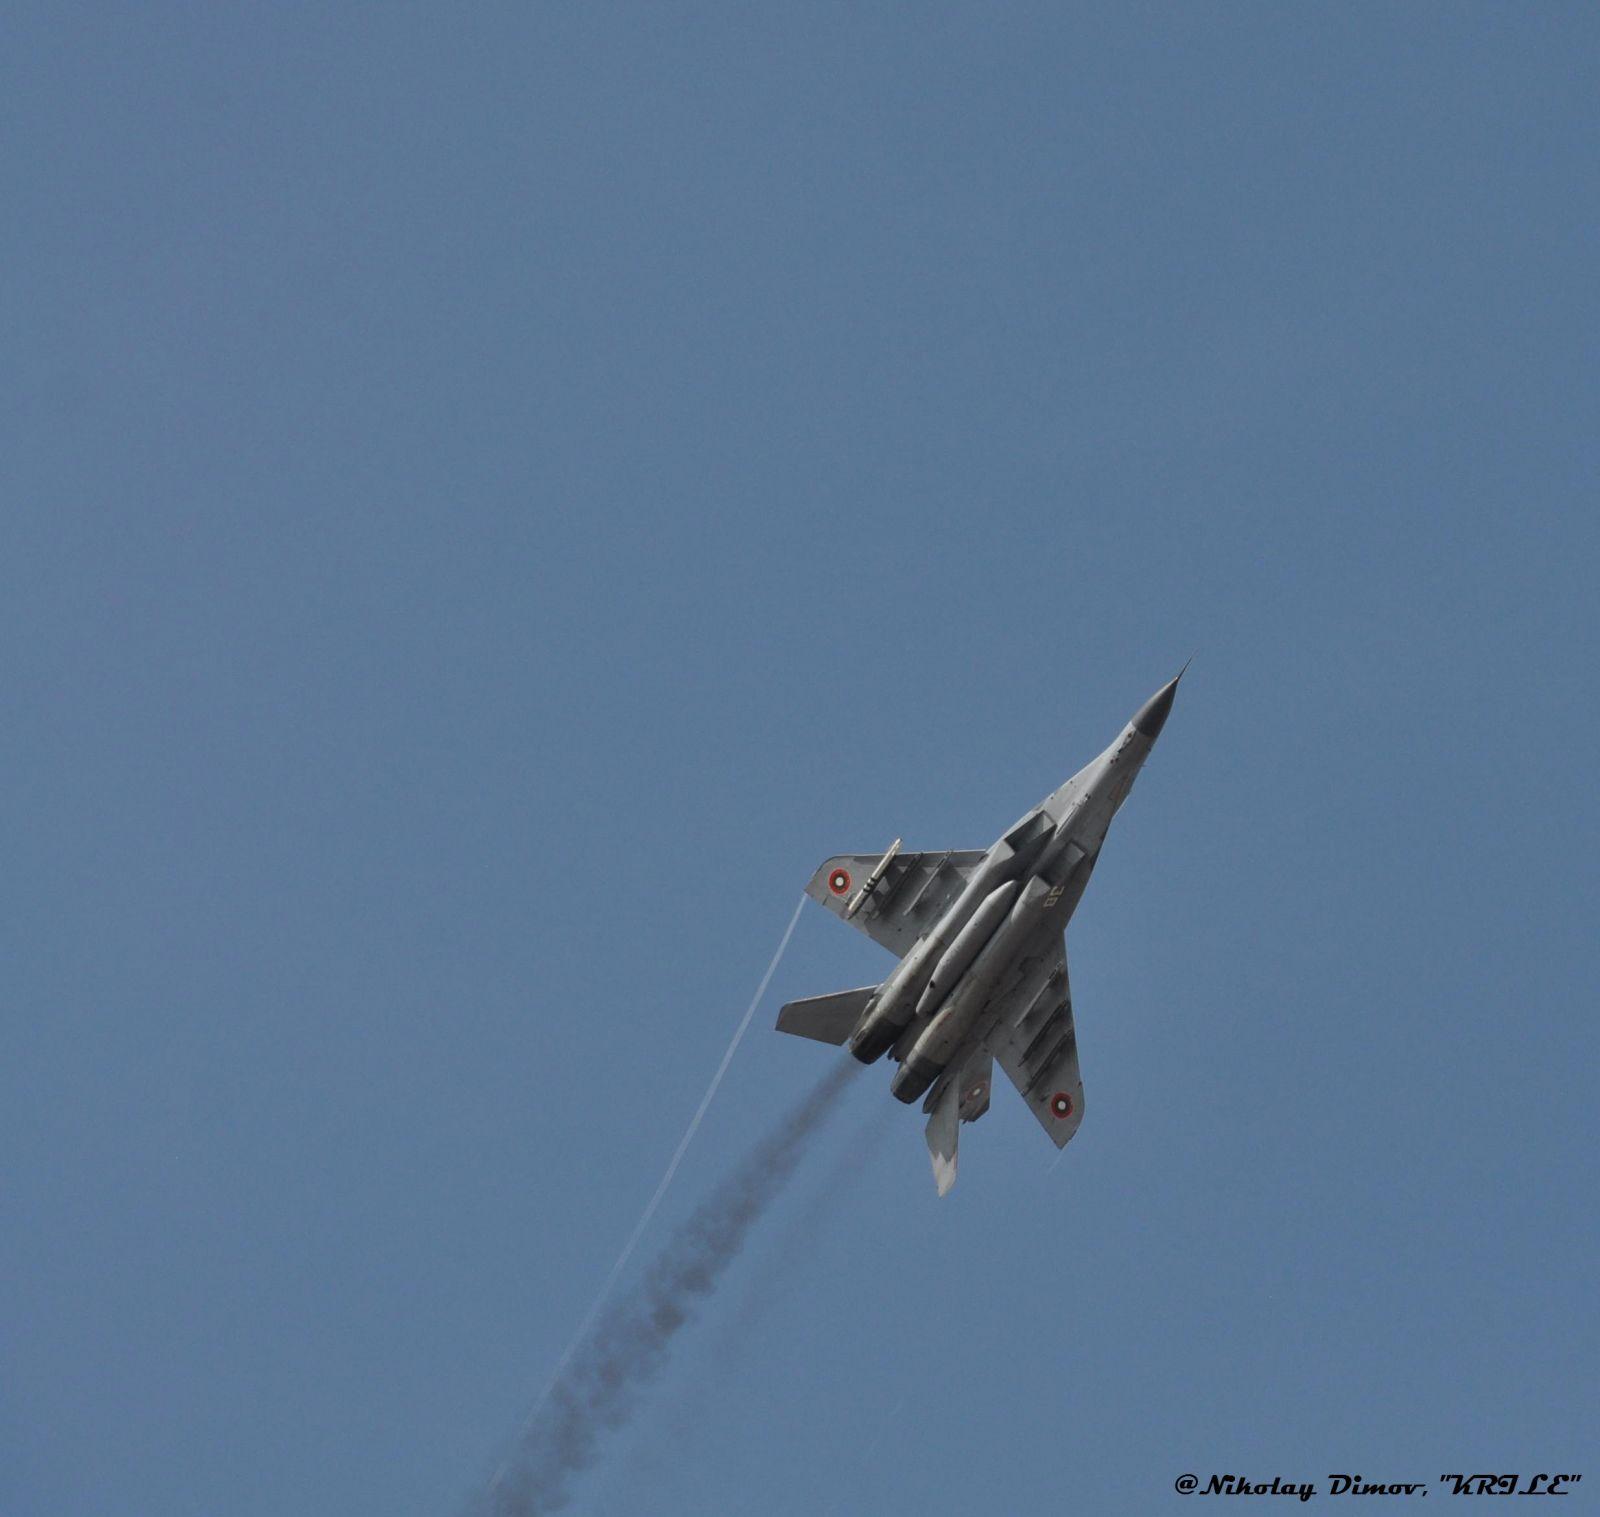 ГАЛЕРИЯ: ТРАКИЙСКА ПЕПЕЛЯНКА 2020 - ПОЛЕТИ НА F-16 И БЪЛГАРСКИ МИГ-29